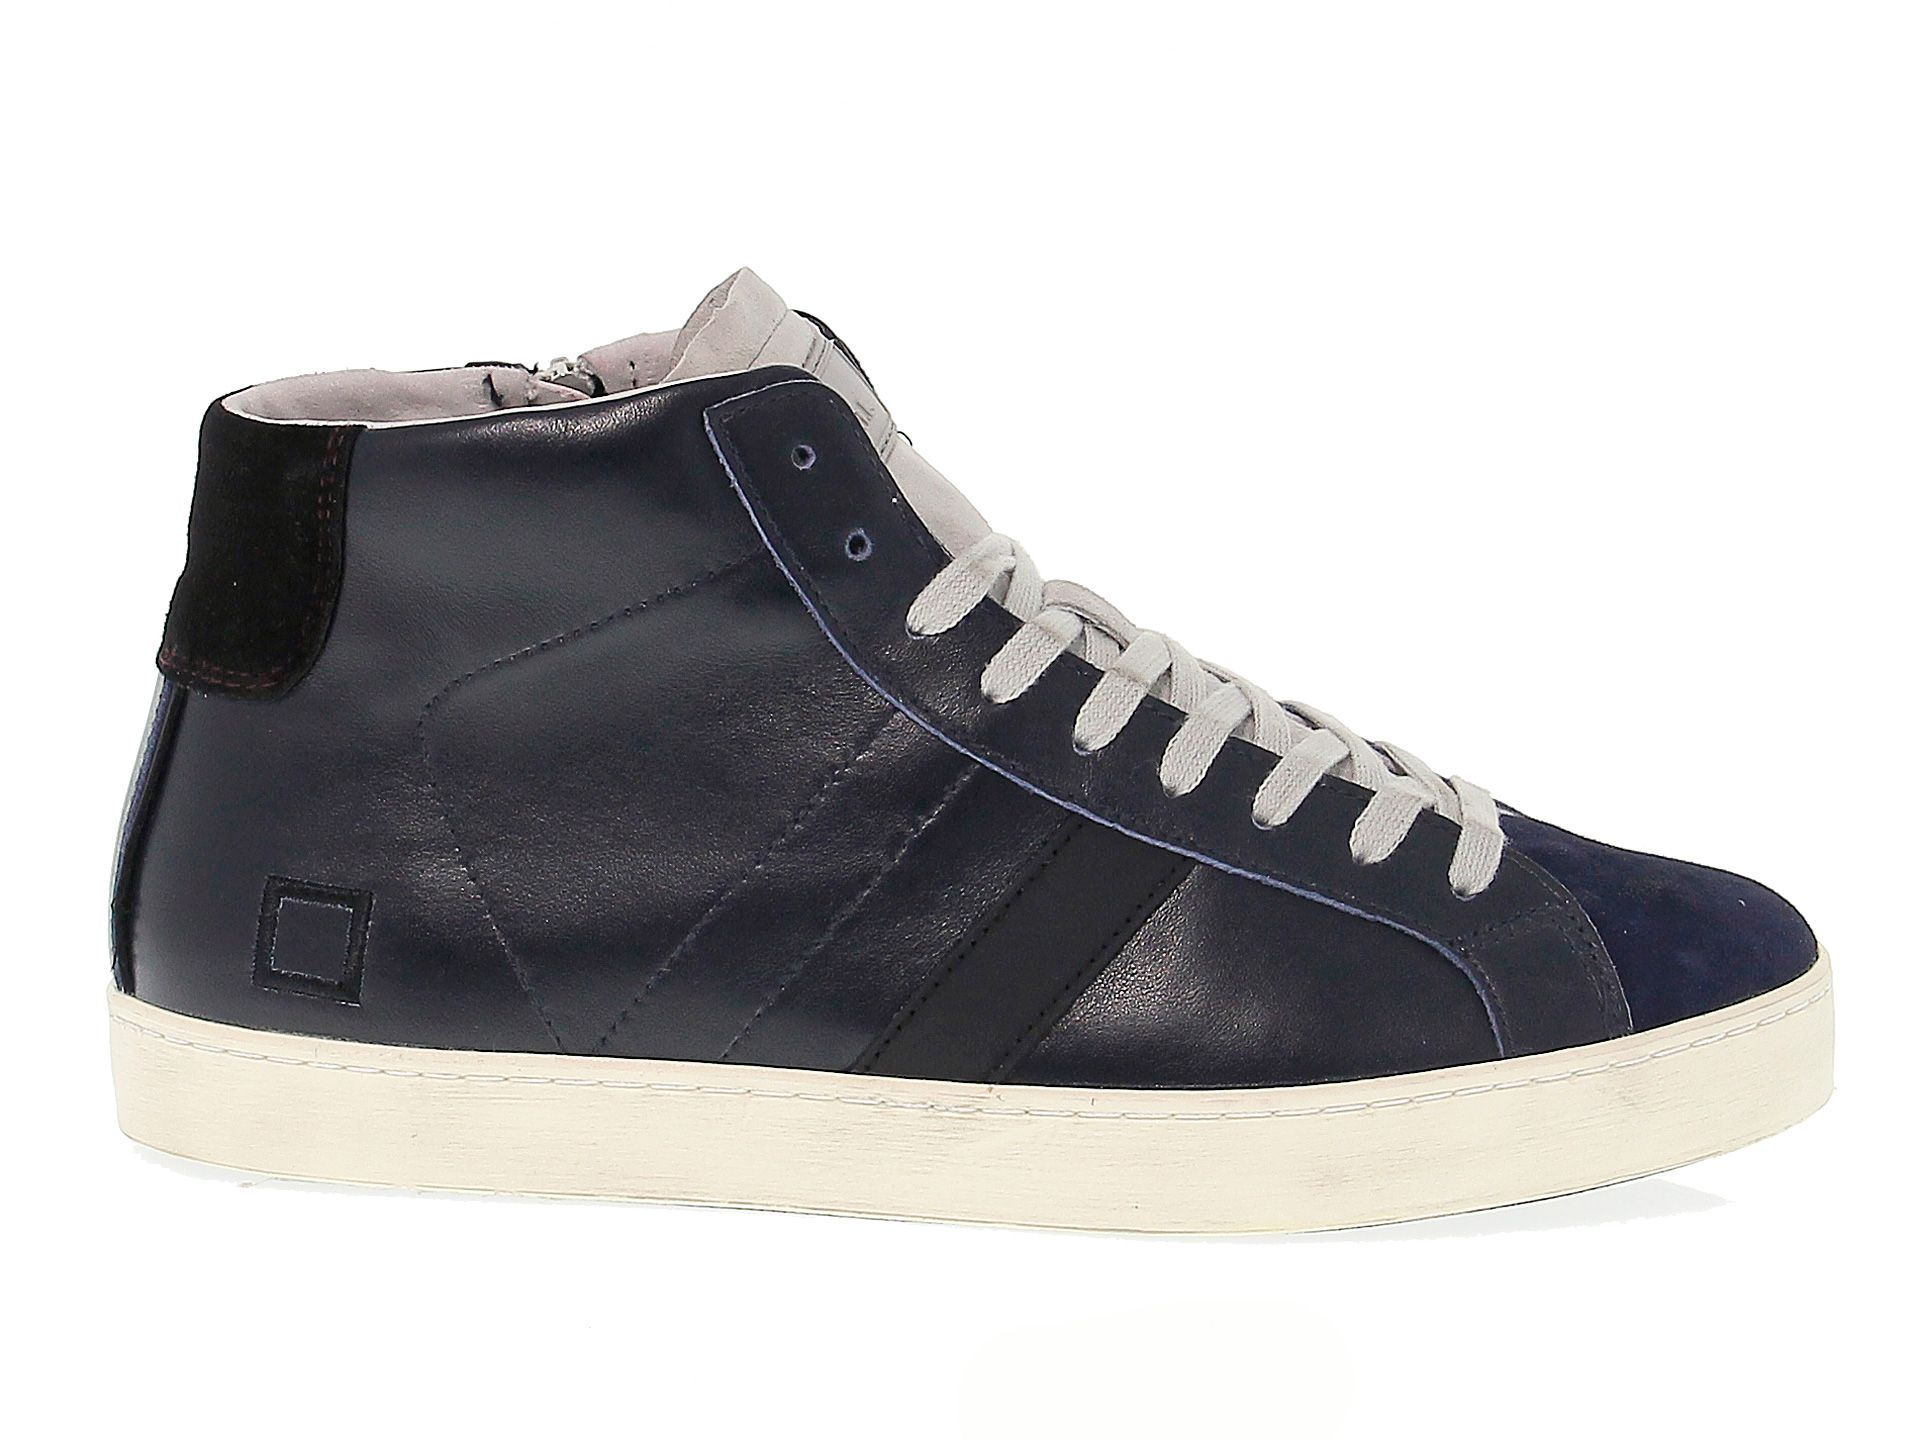 D.a.t.e. Men's Blue Other Materials Sneakers